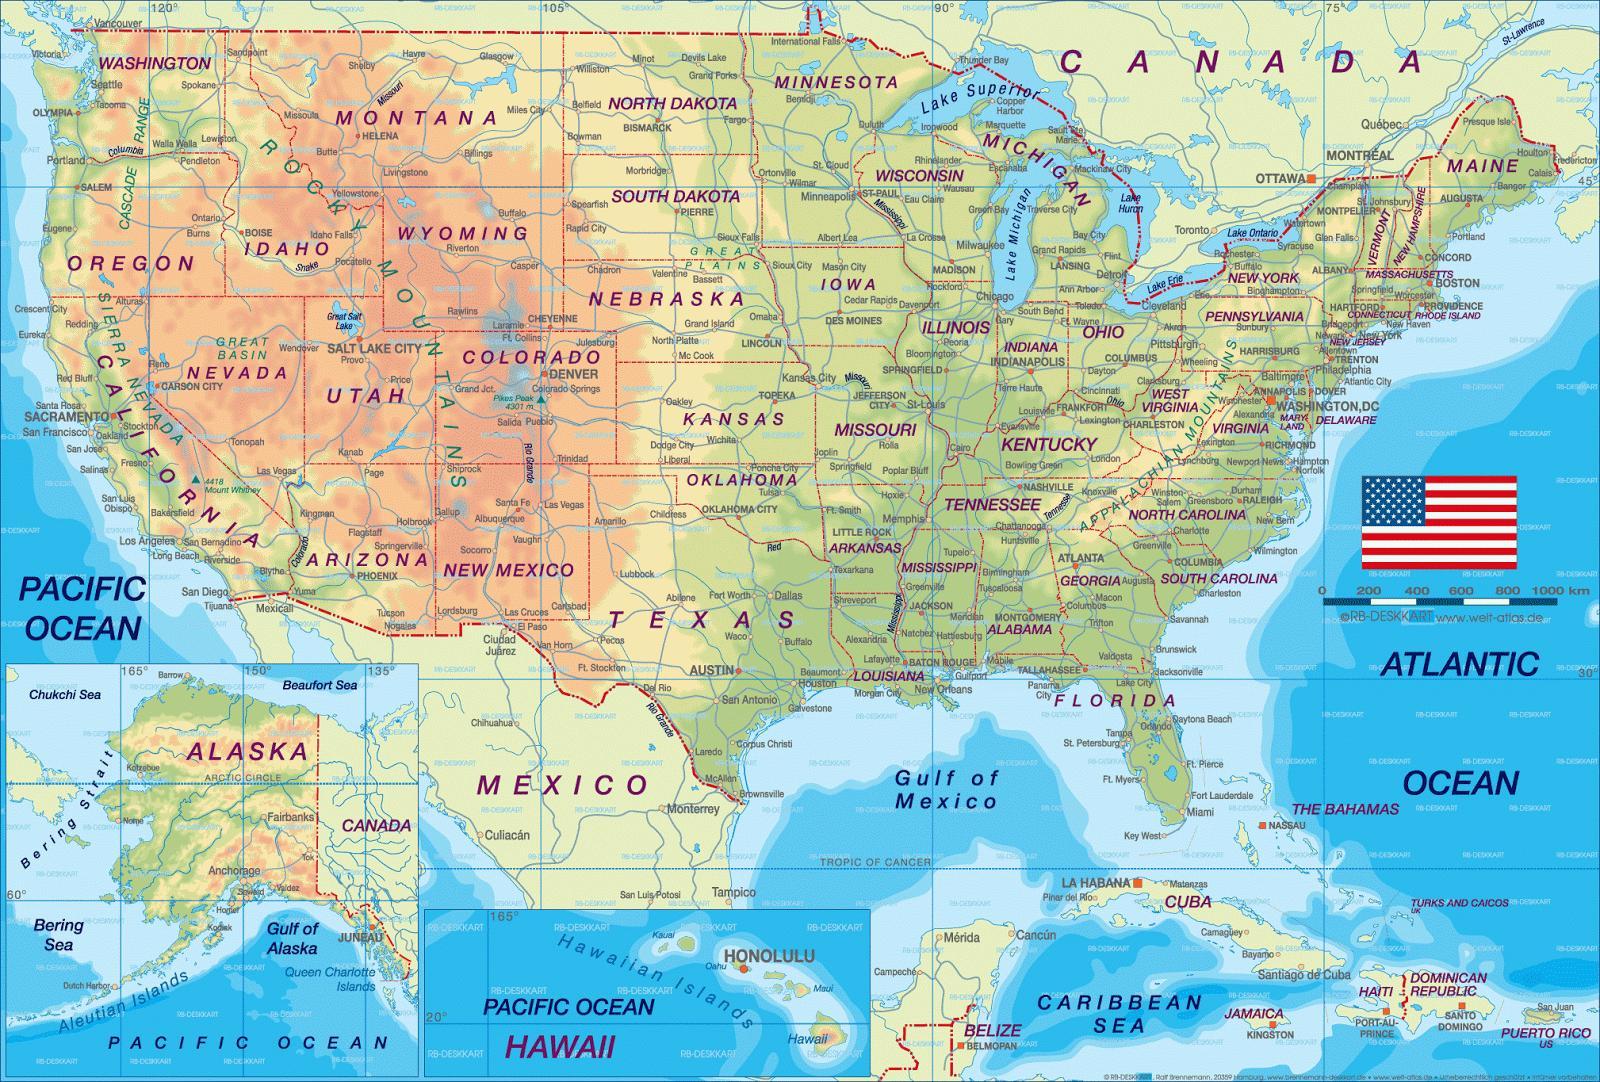 karta usa städer Karta över städer i USA   USA karta över städer (Nordamerika och  karta usa städer